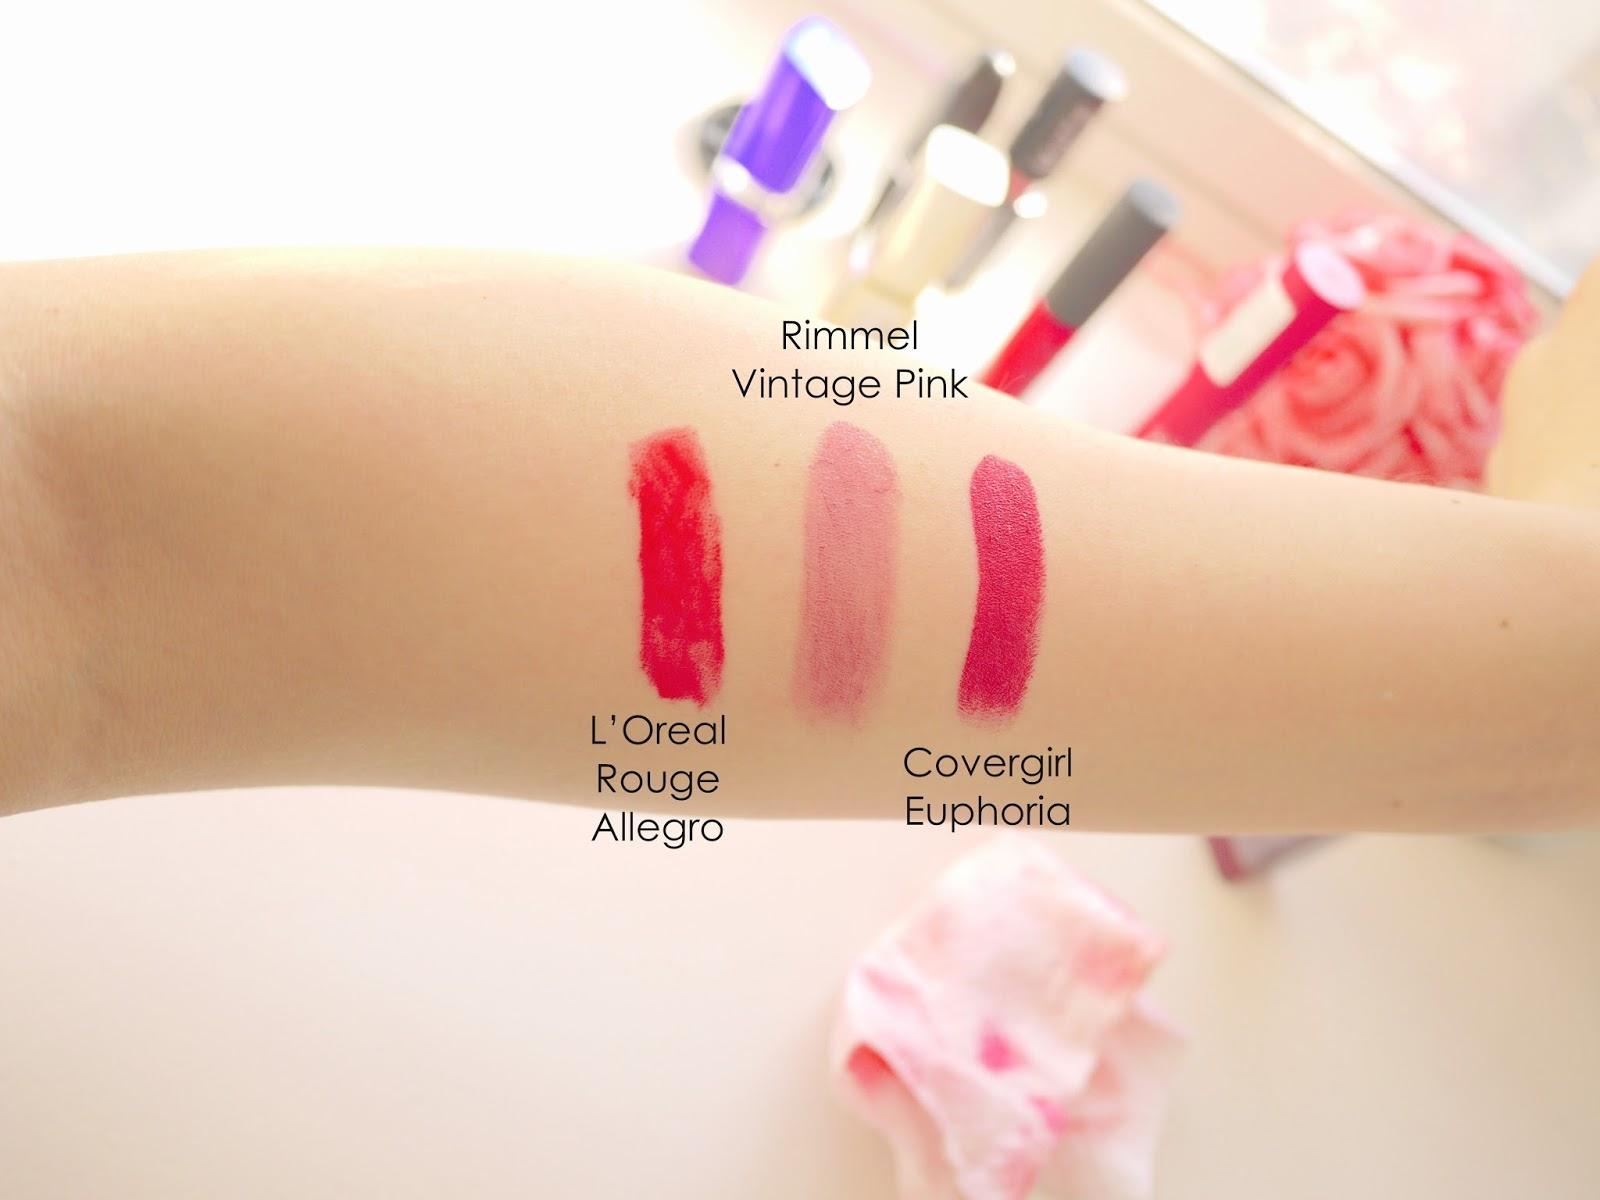 l'oreal rouge allegro rimmel vintage pink covergirl euphoria statement lipsticks swatchs